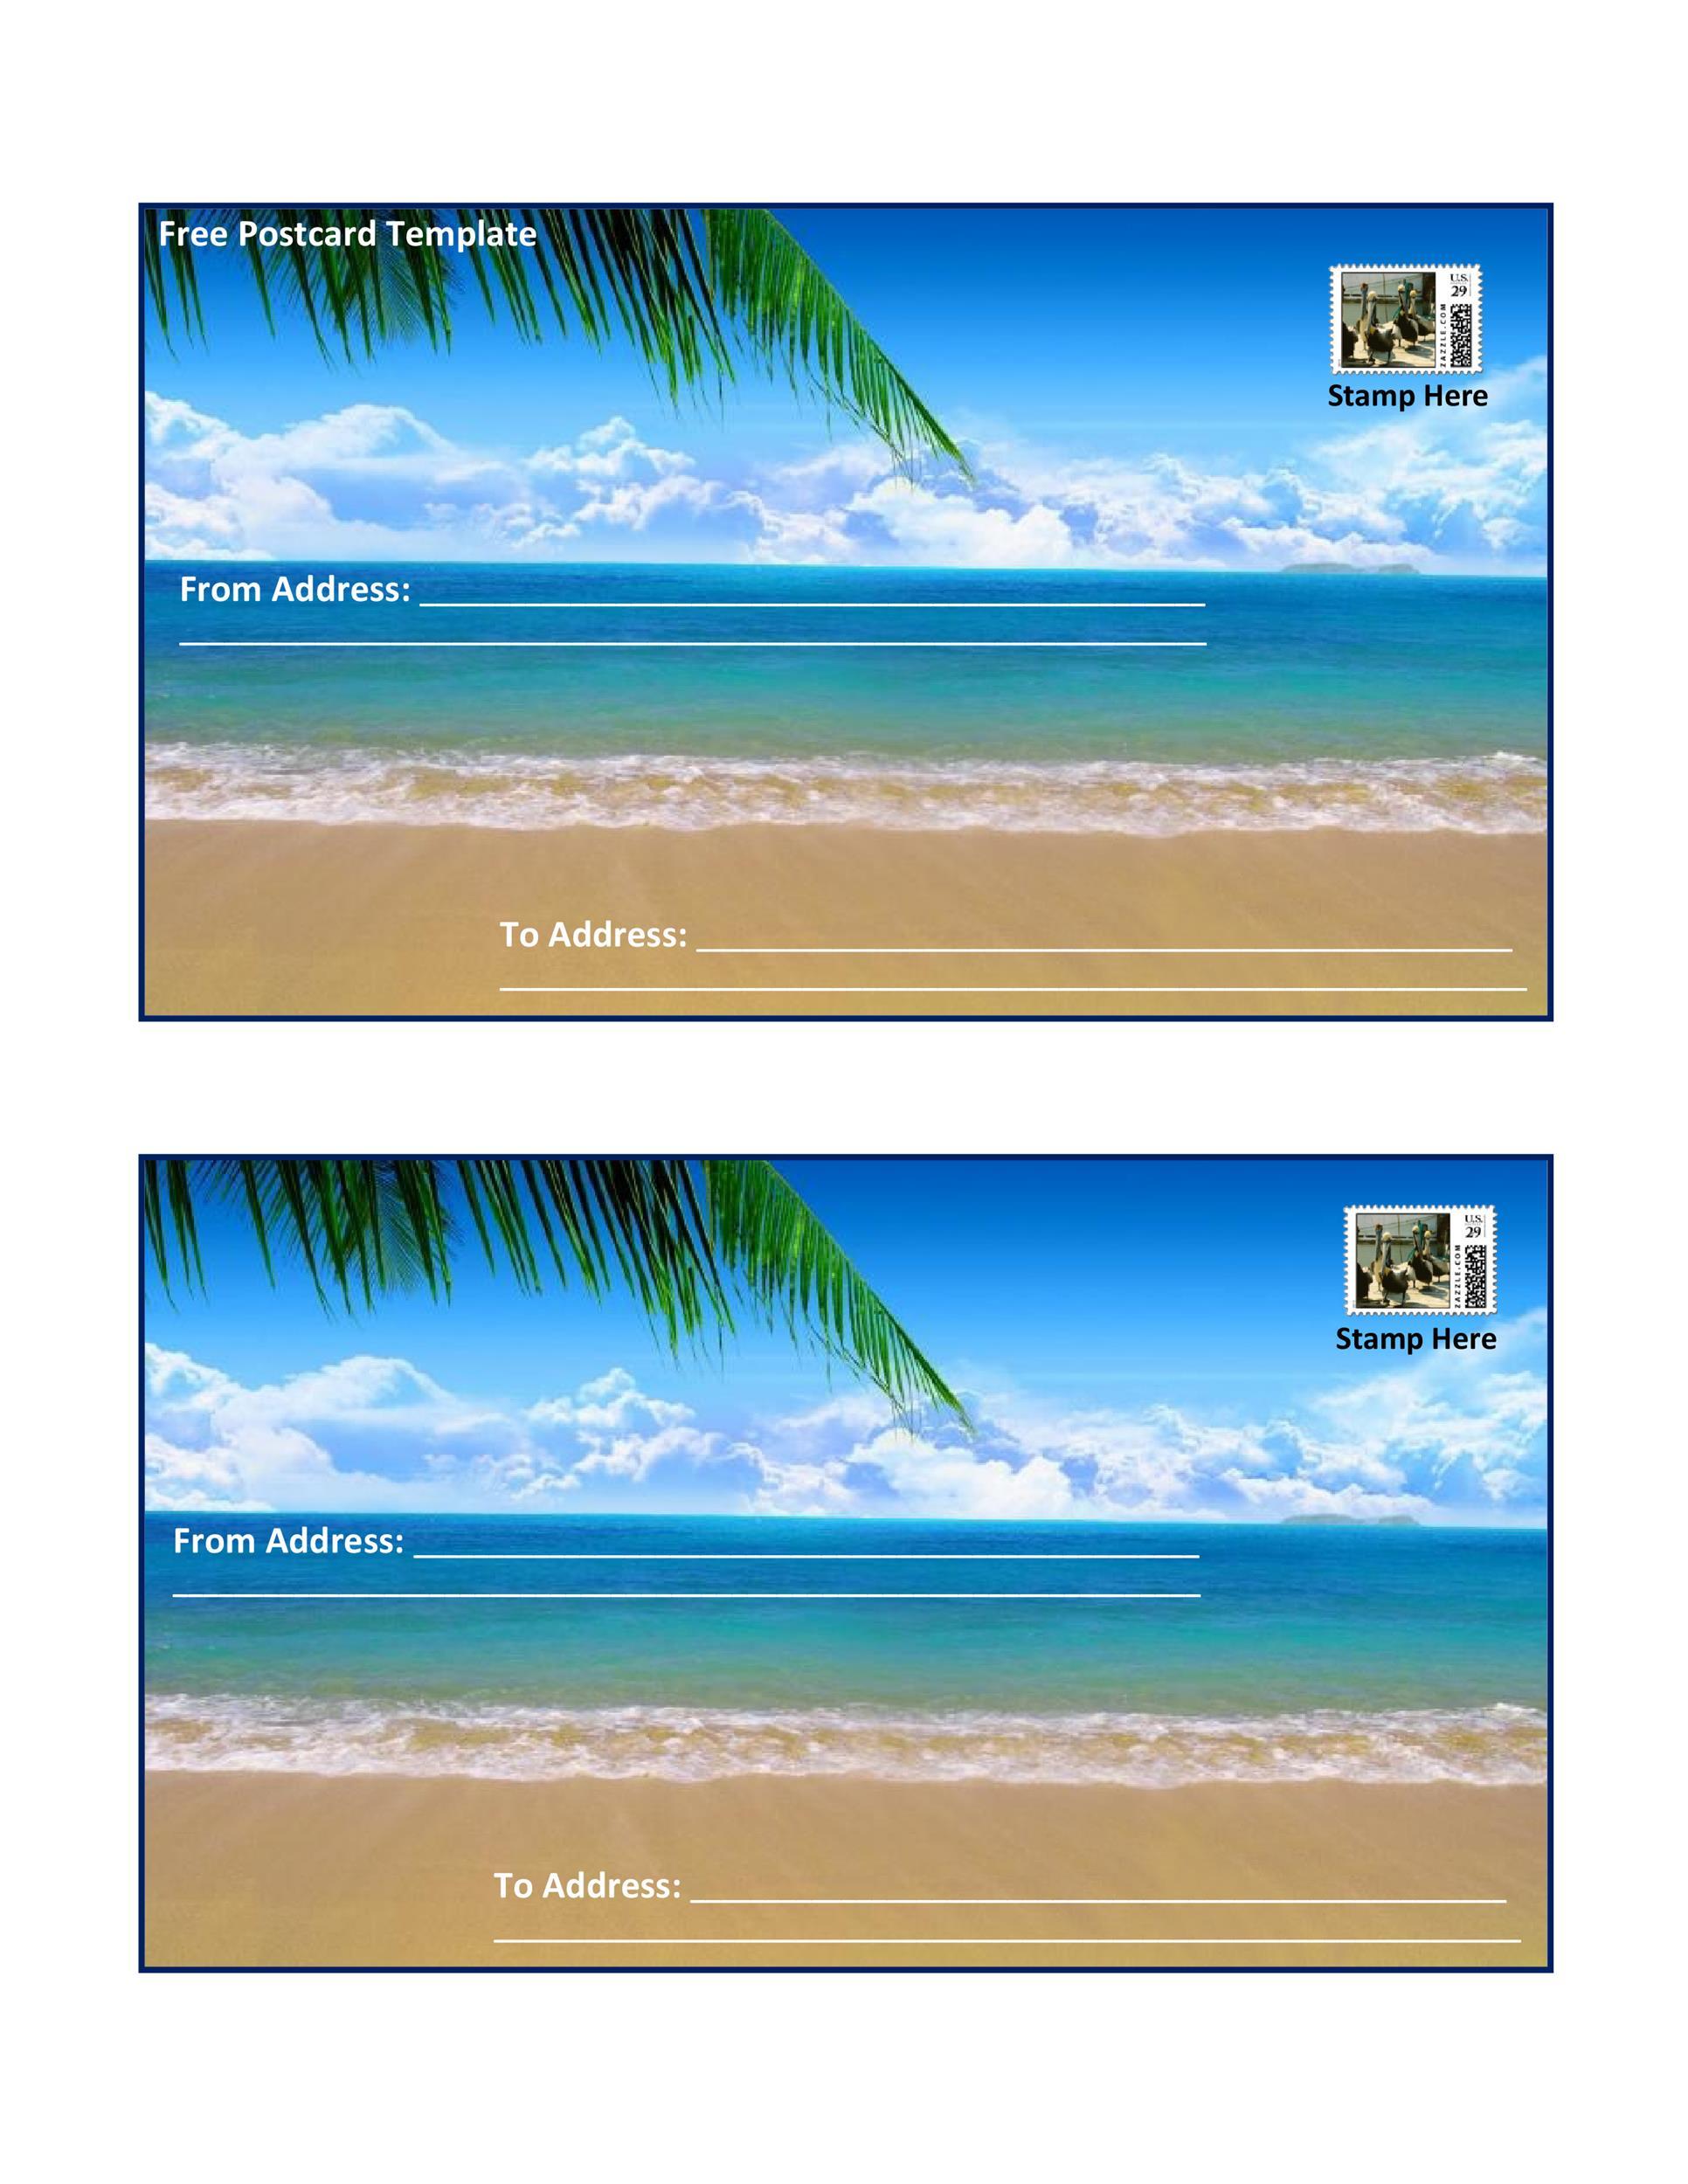 Free postcard template 15